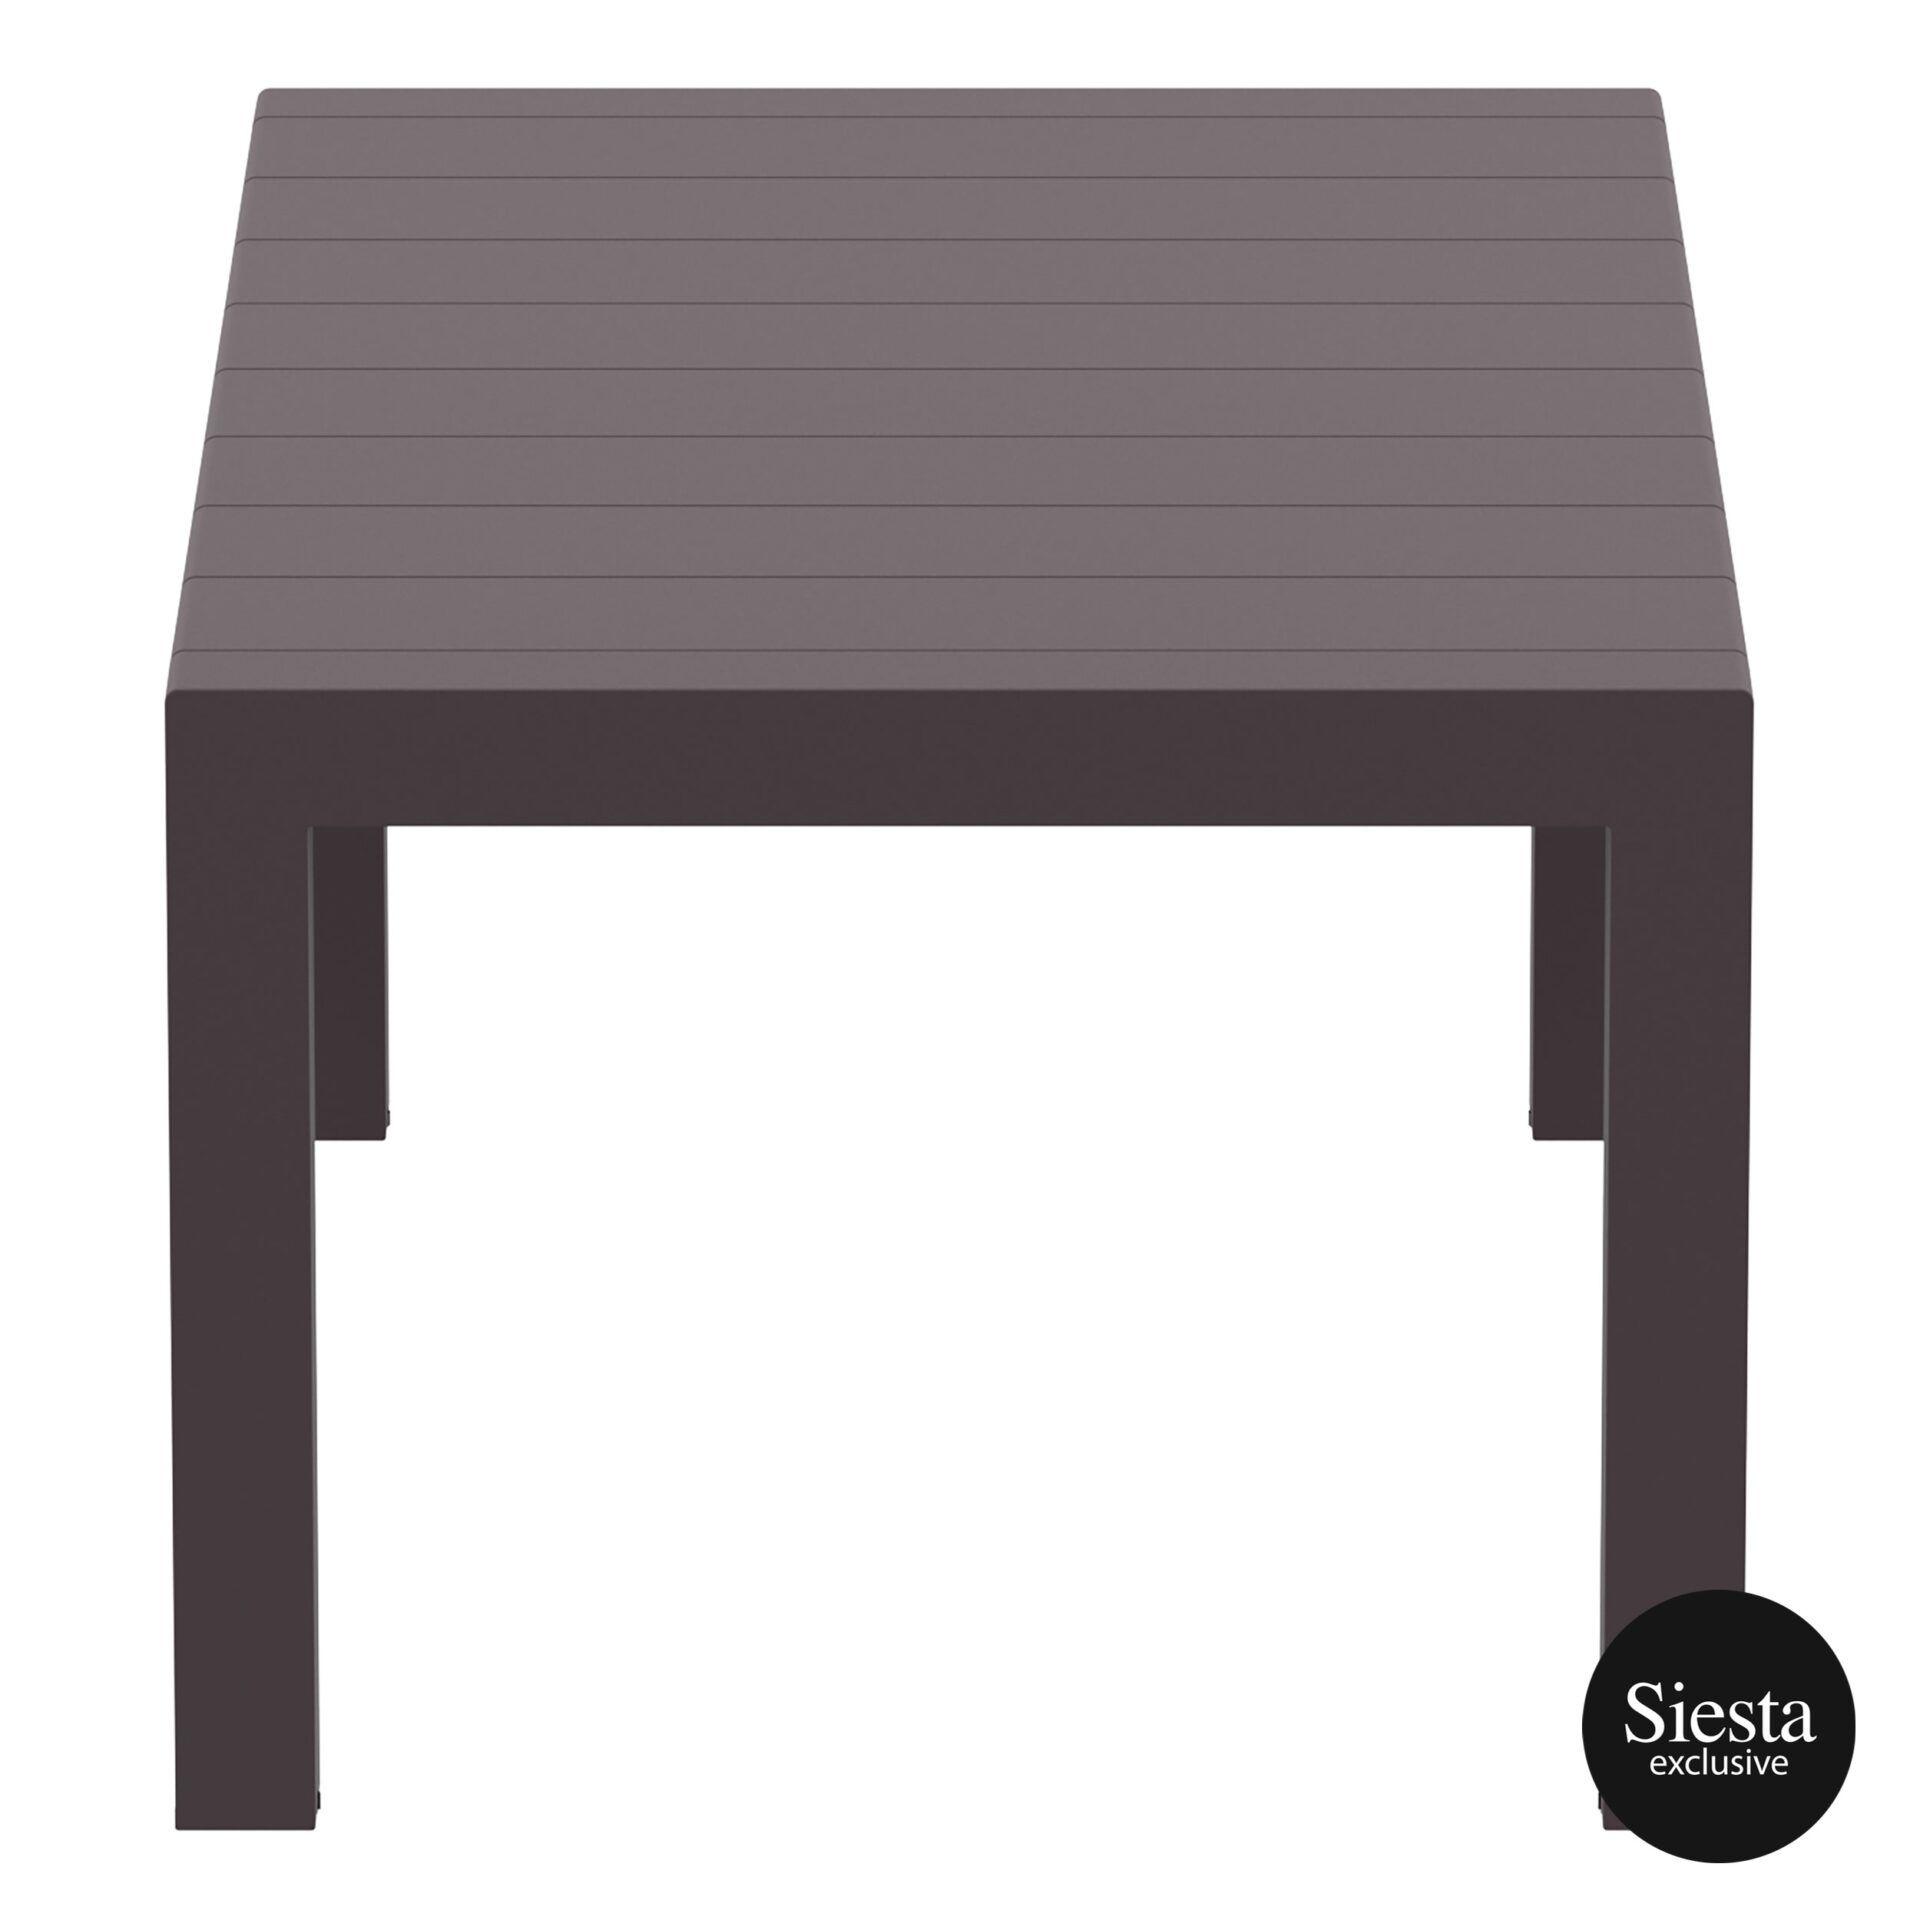 009 vegas medium table 180 rattan brown short edge